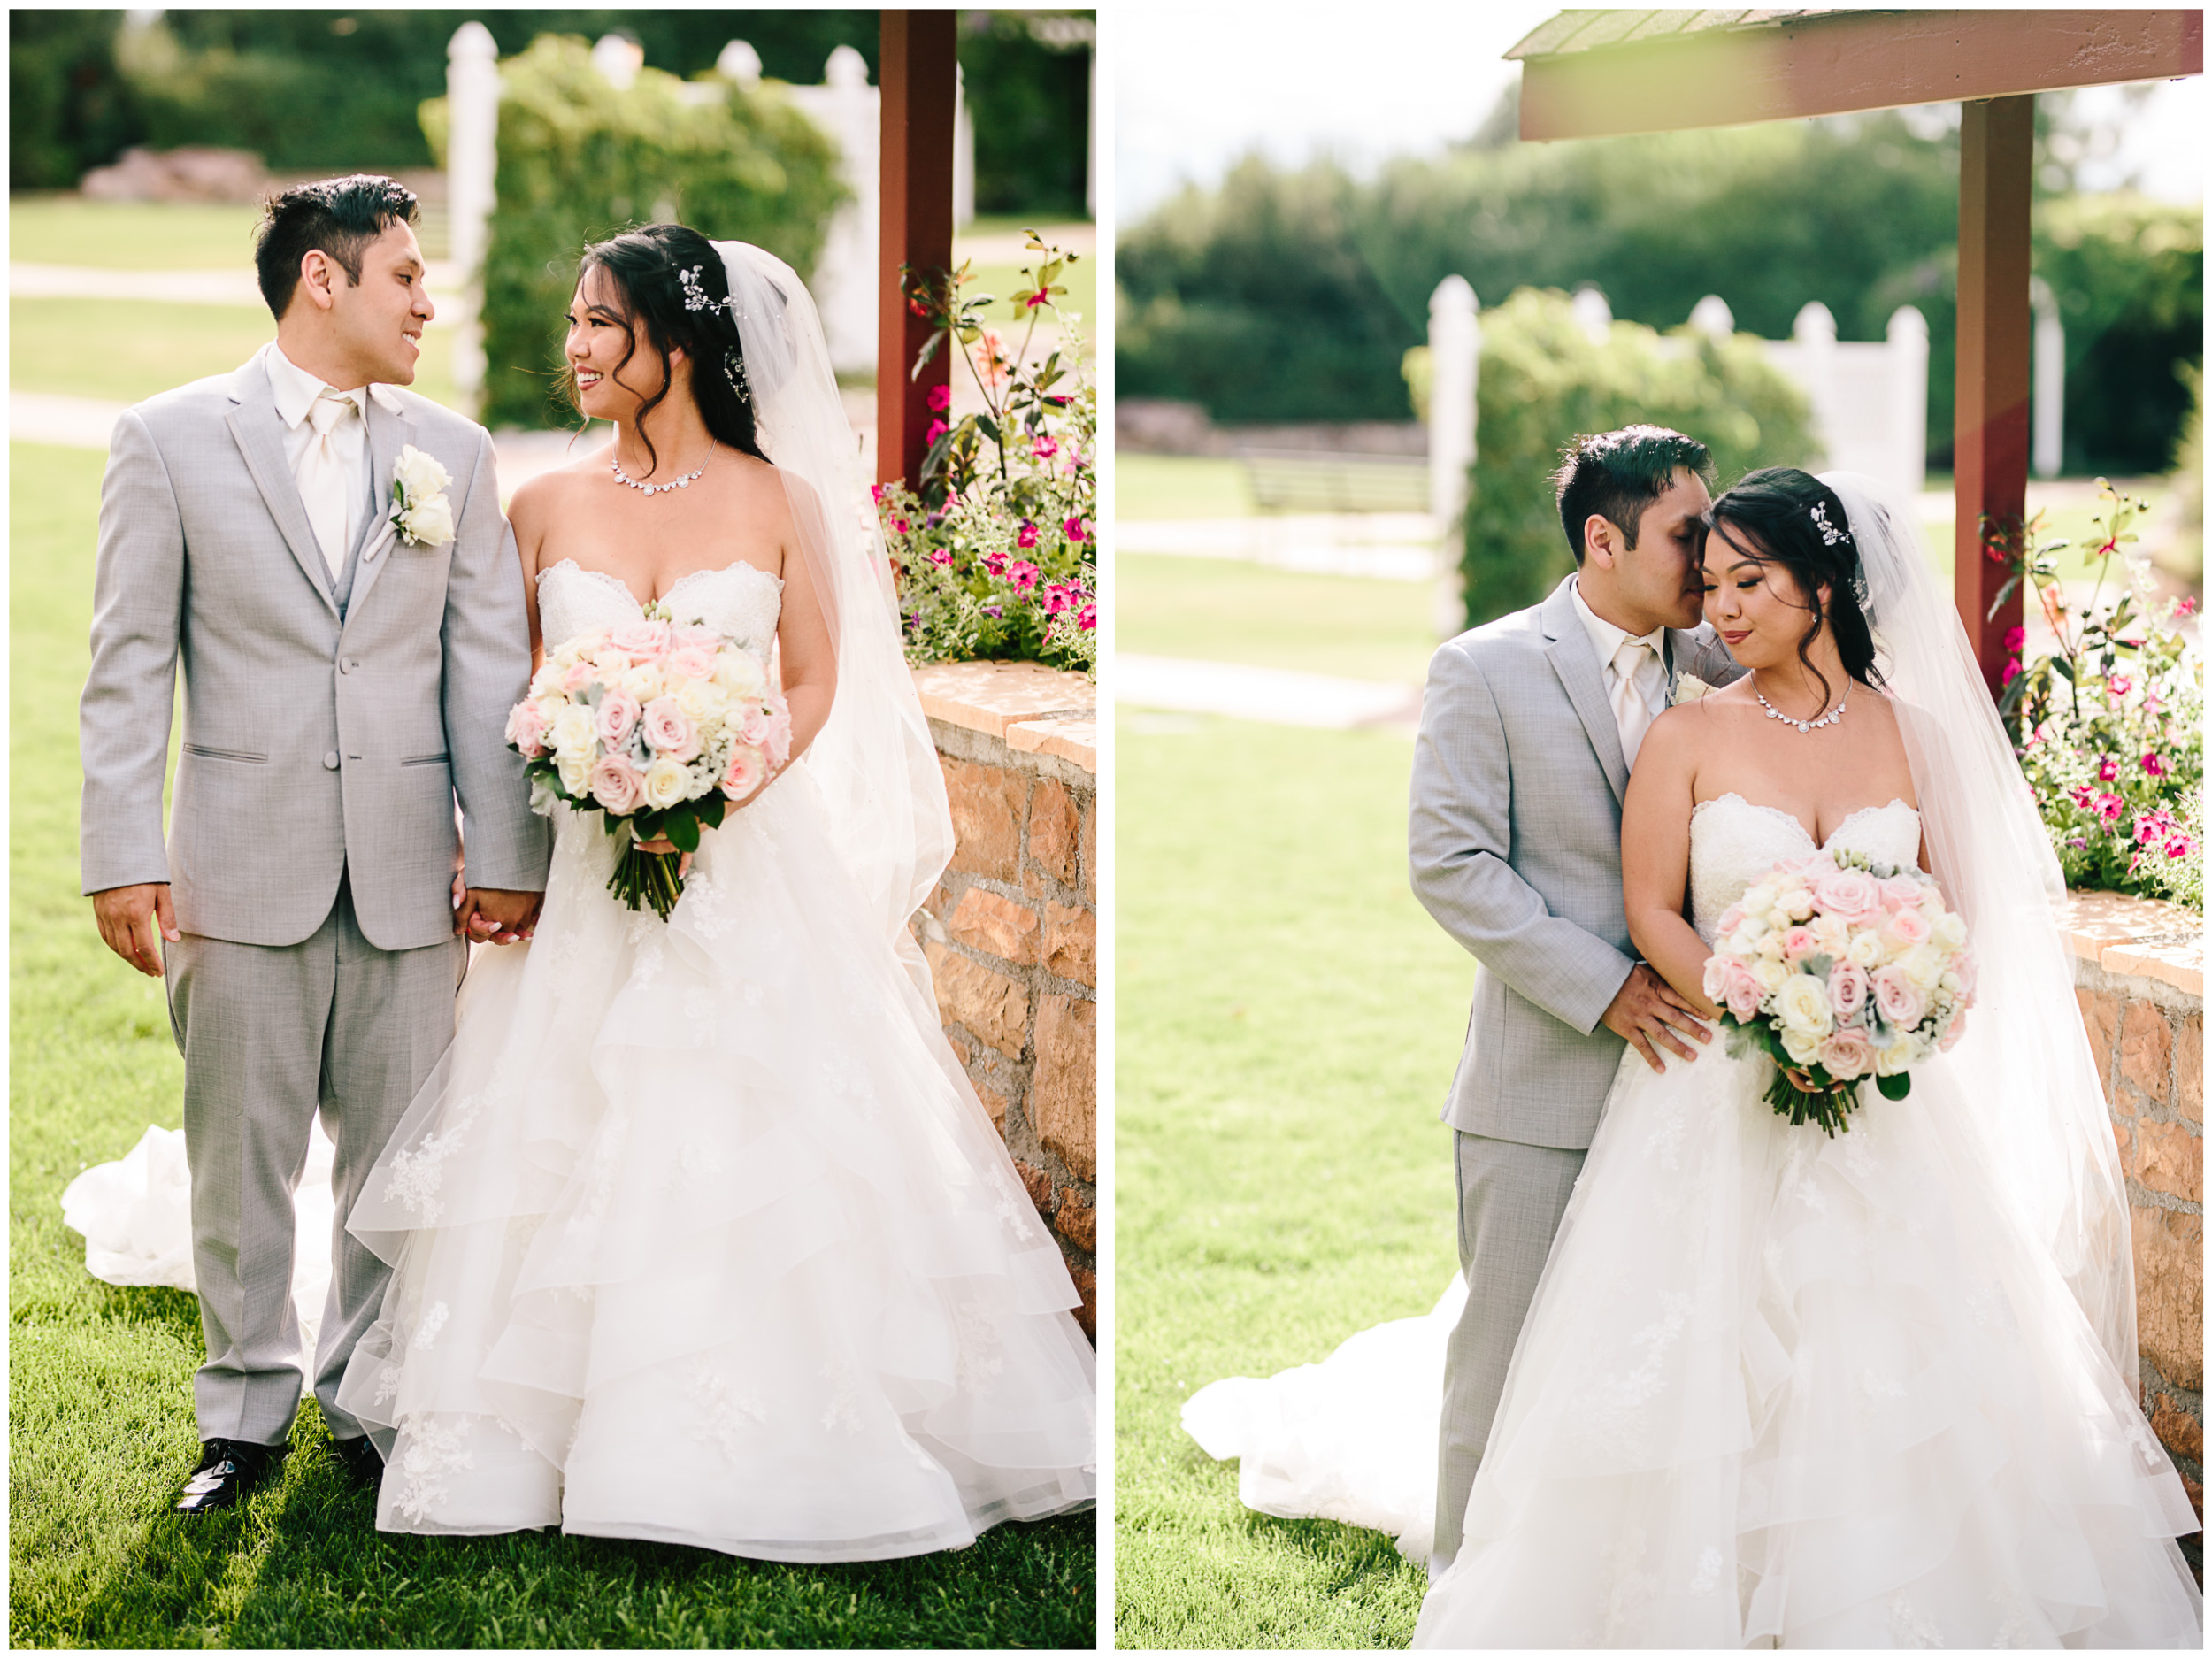 stonebrook_manor_wedding_21.jpg